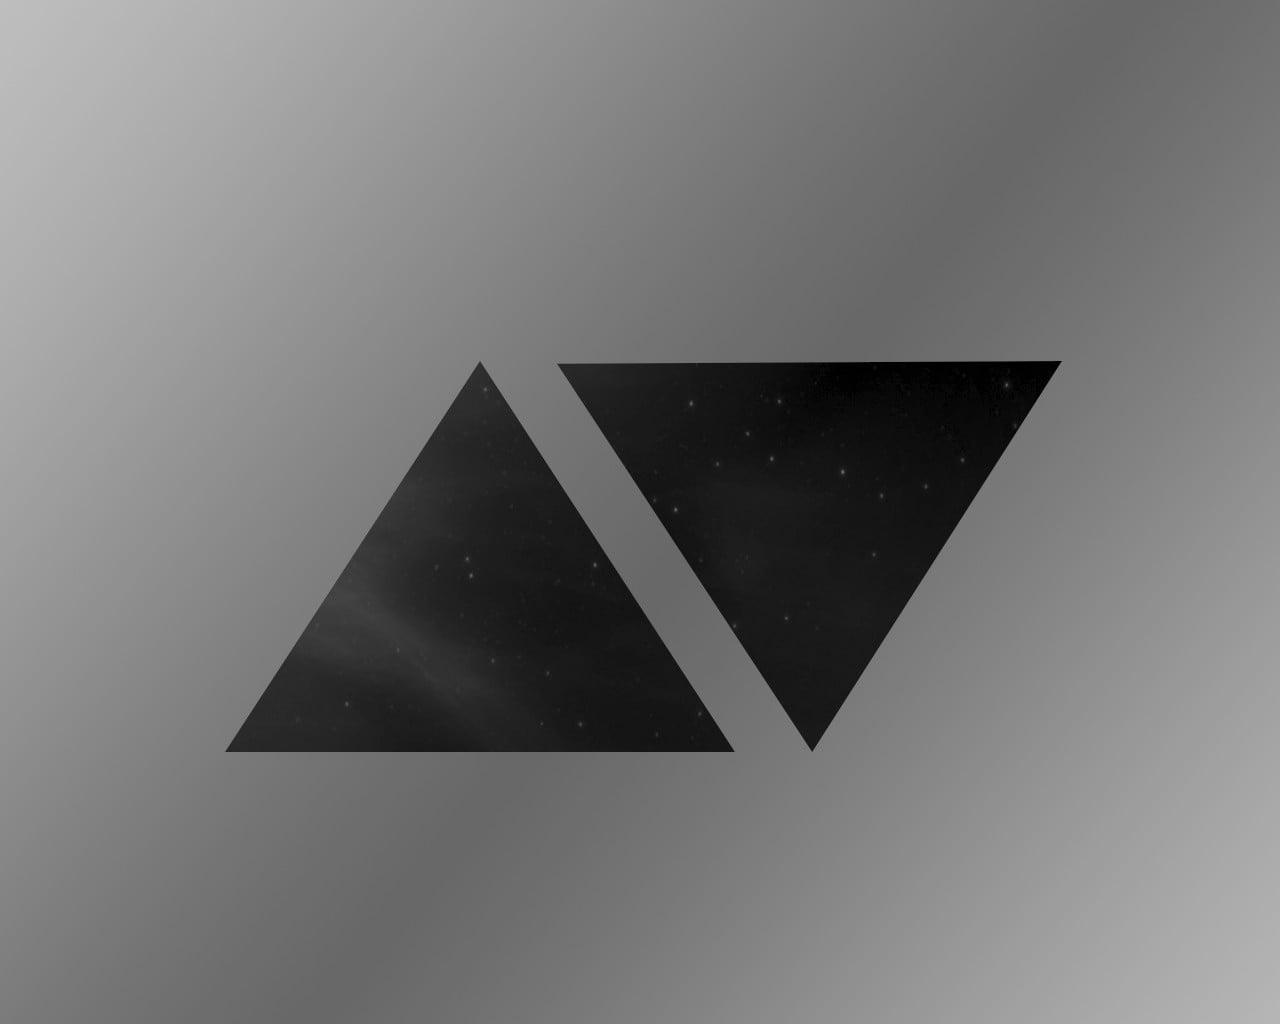 avicii logo triangle dark